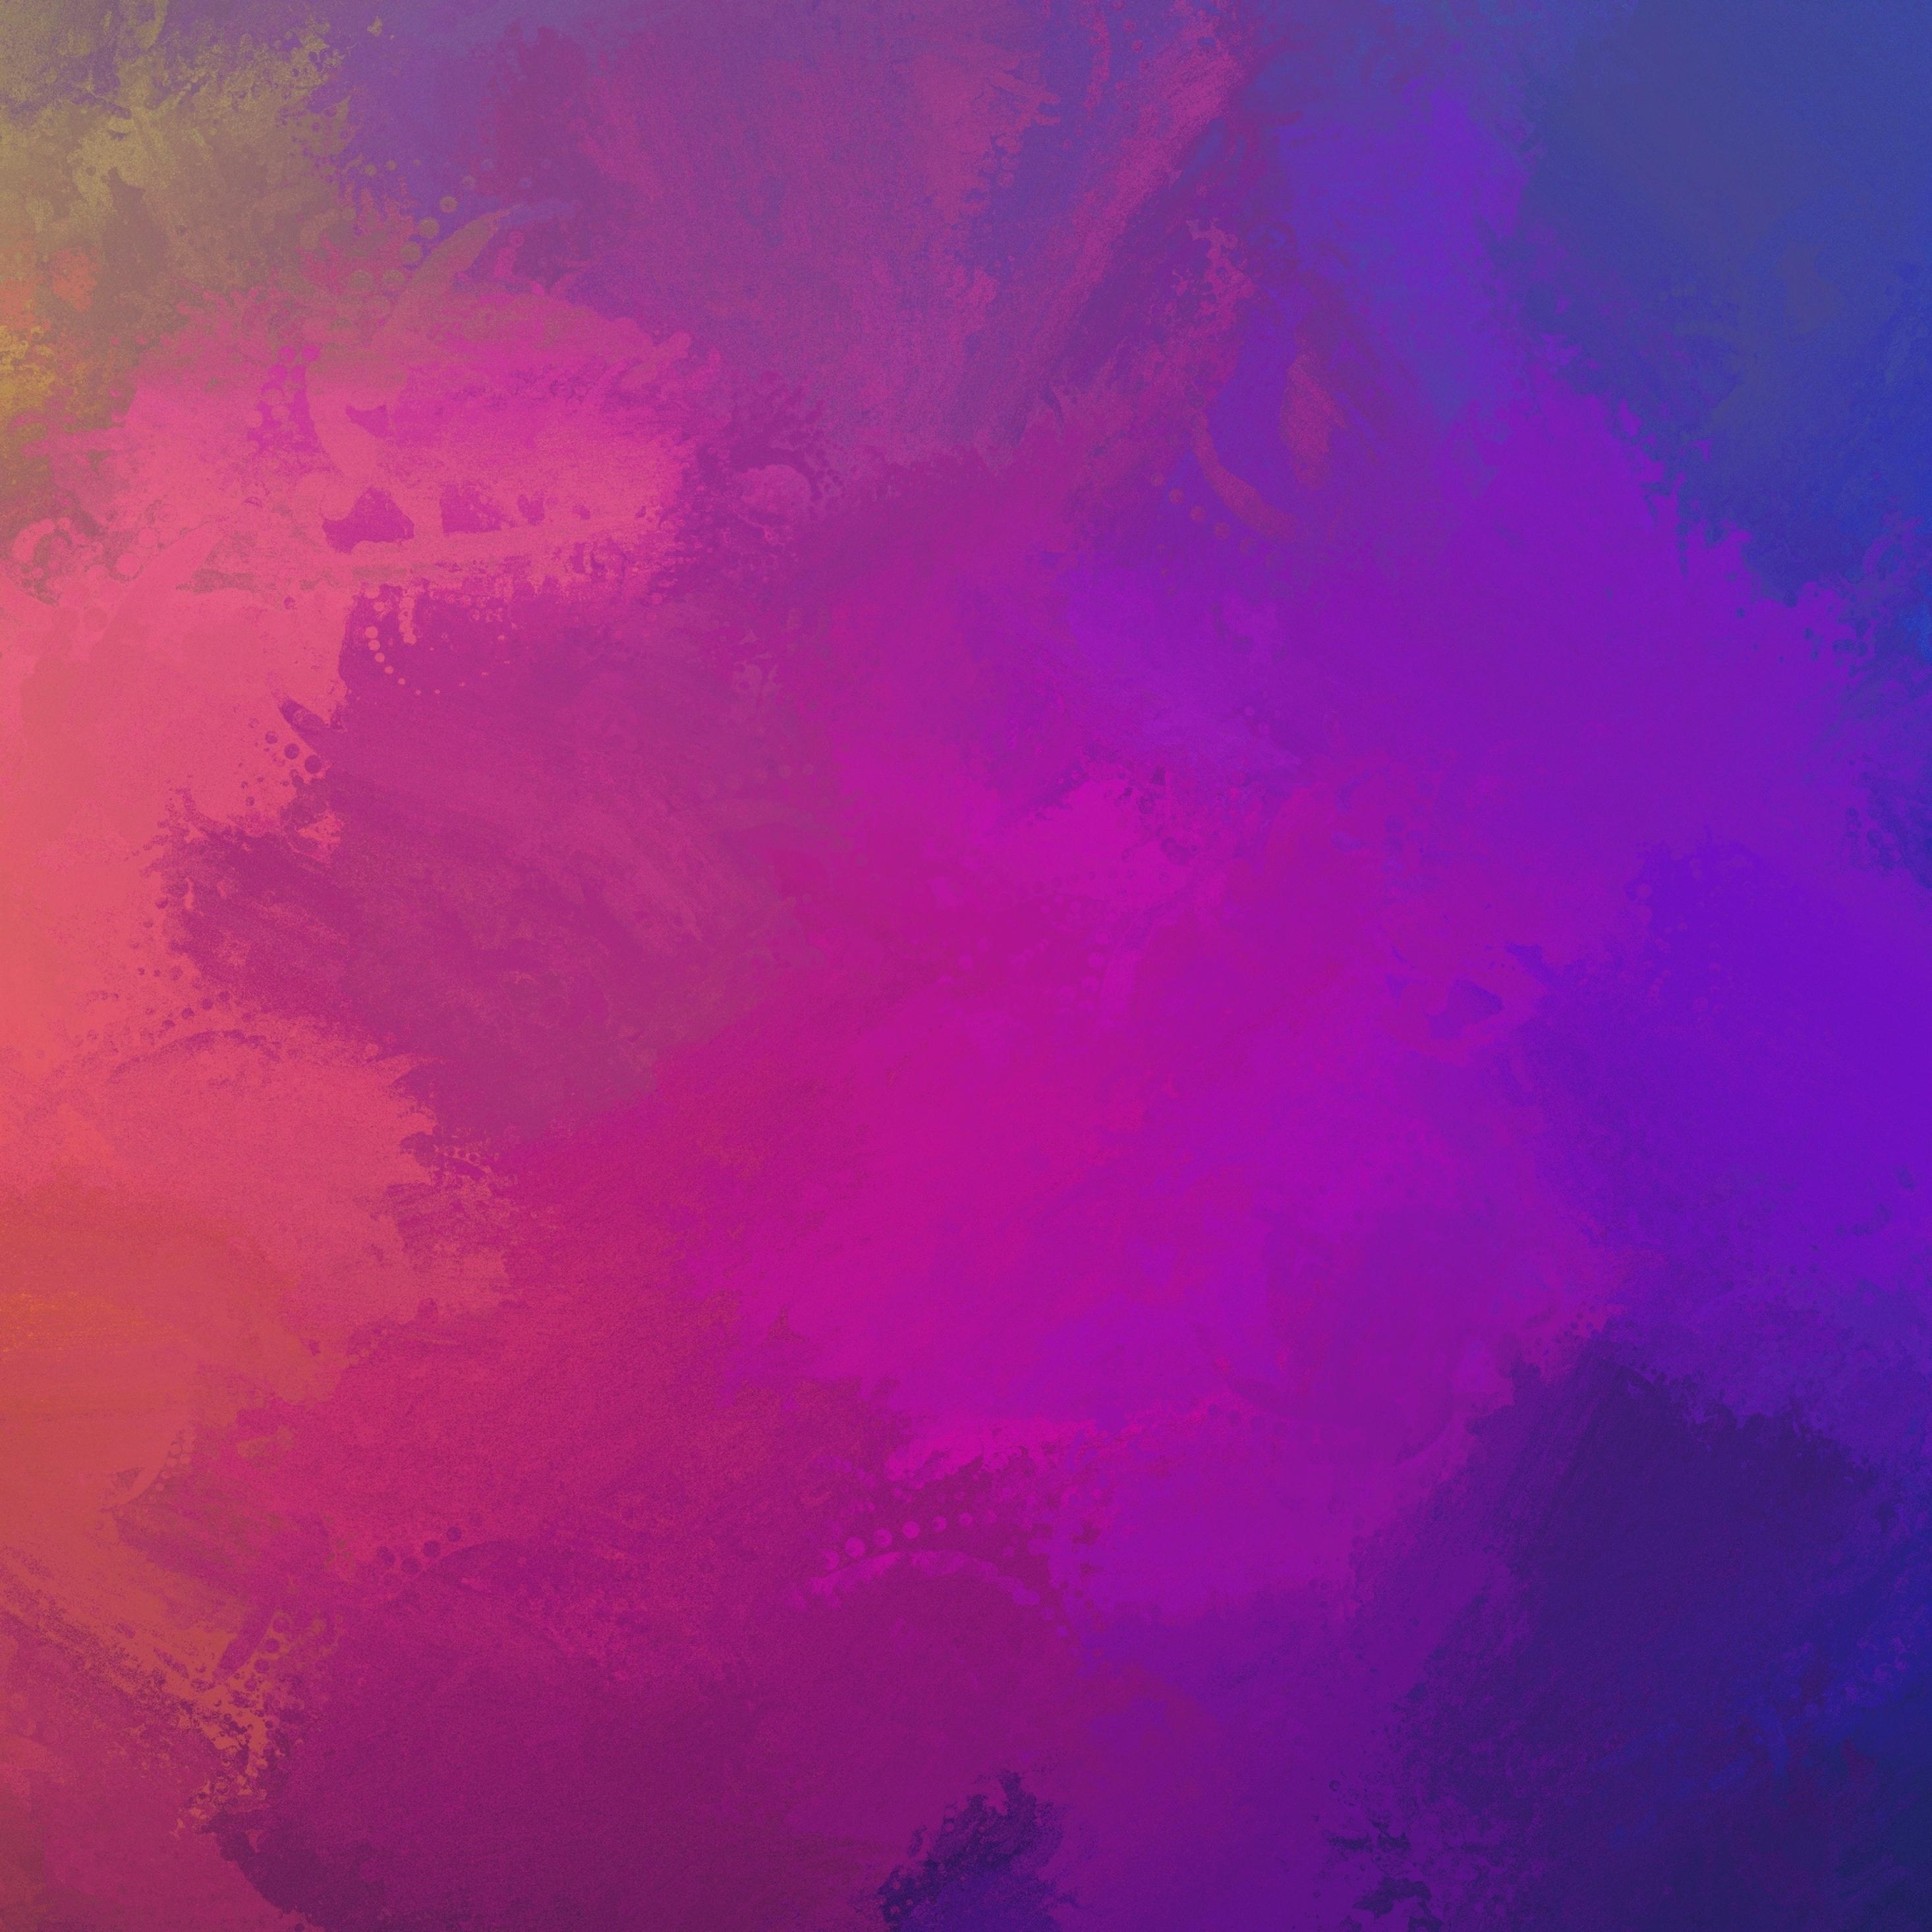 2932x2932 Color Palette Abstract 4K Ipad Pro Retina